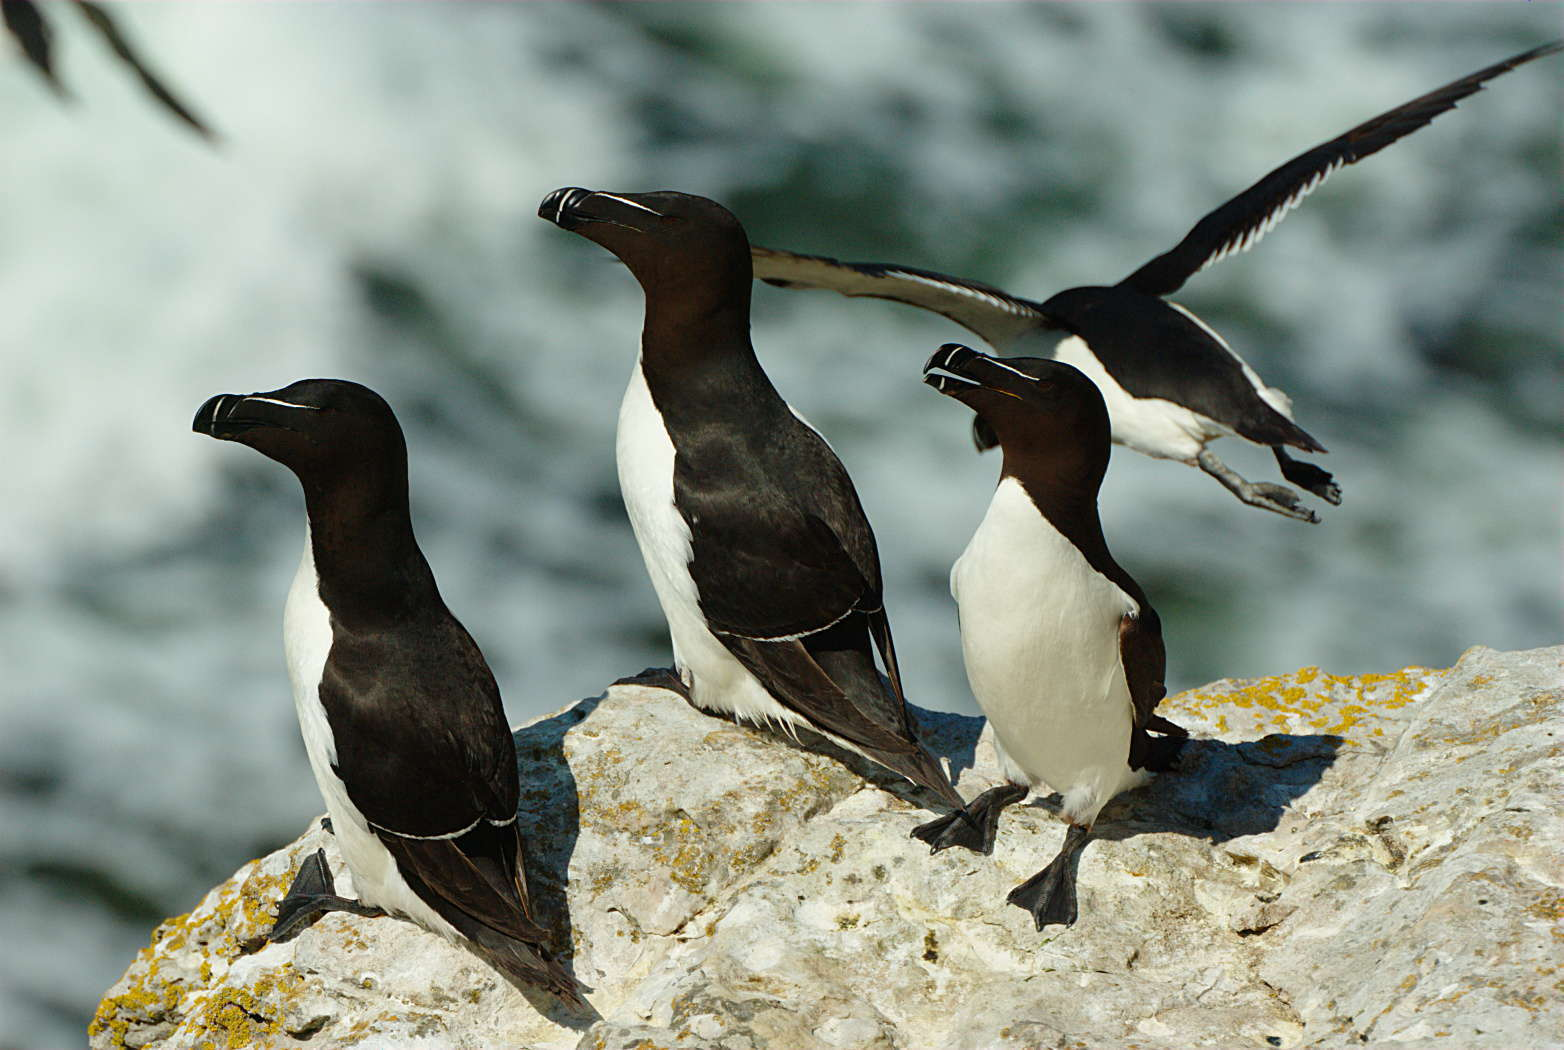 Pingouin torda (Crédits: Stefan Berndtsson - flickr)